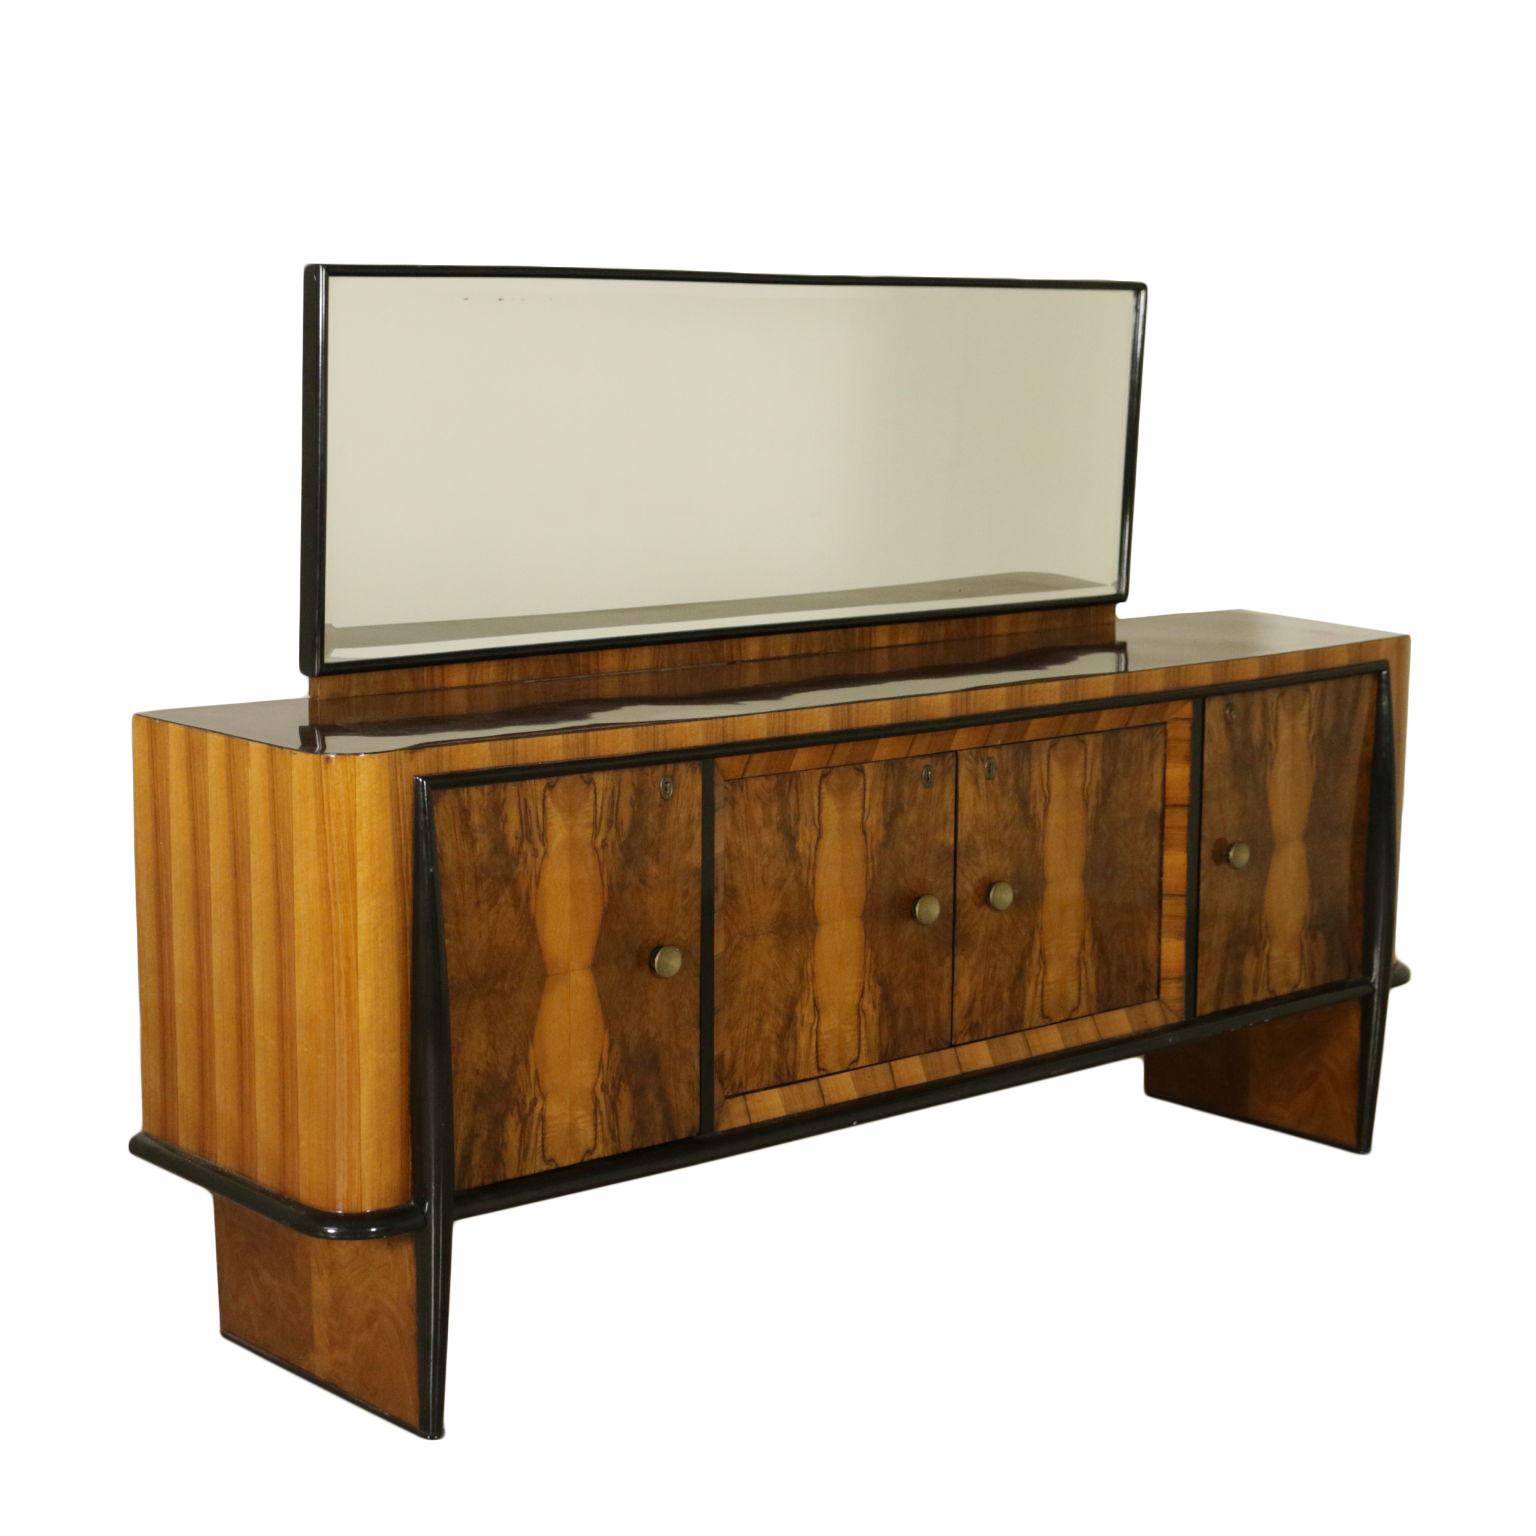 Cr dence ann es 30 40 meubles design moderne - Buffet annee 30 ...